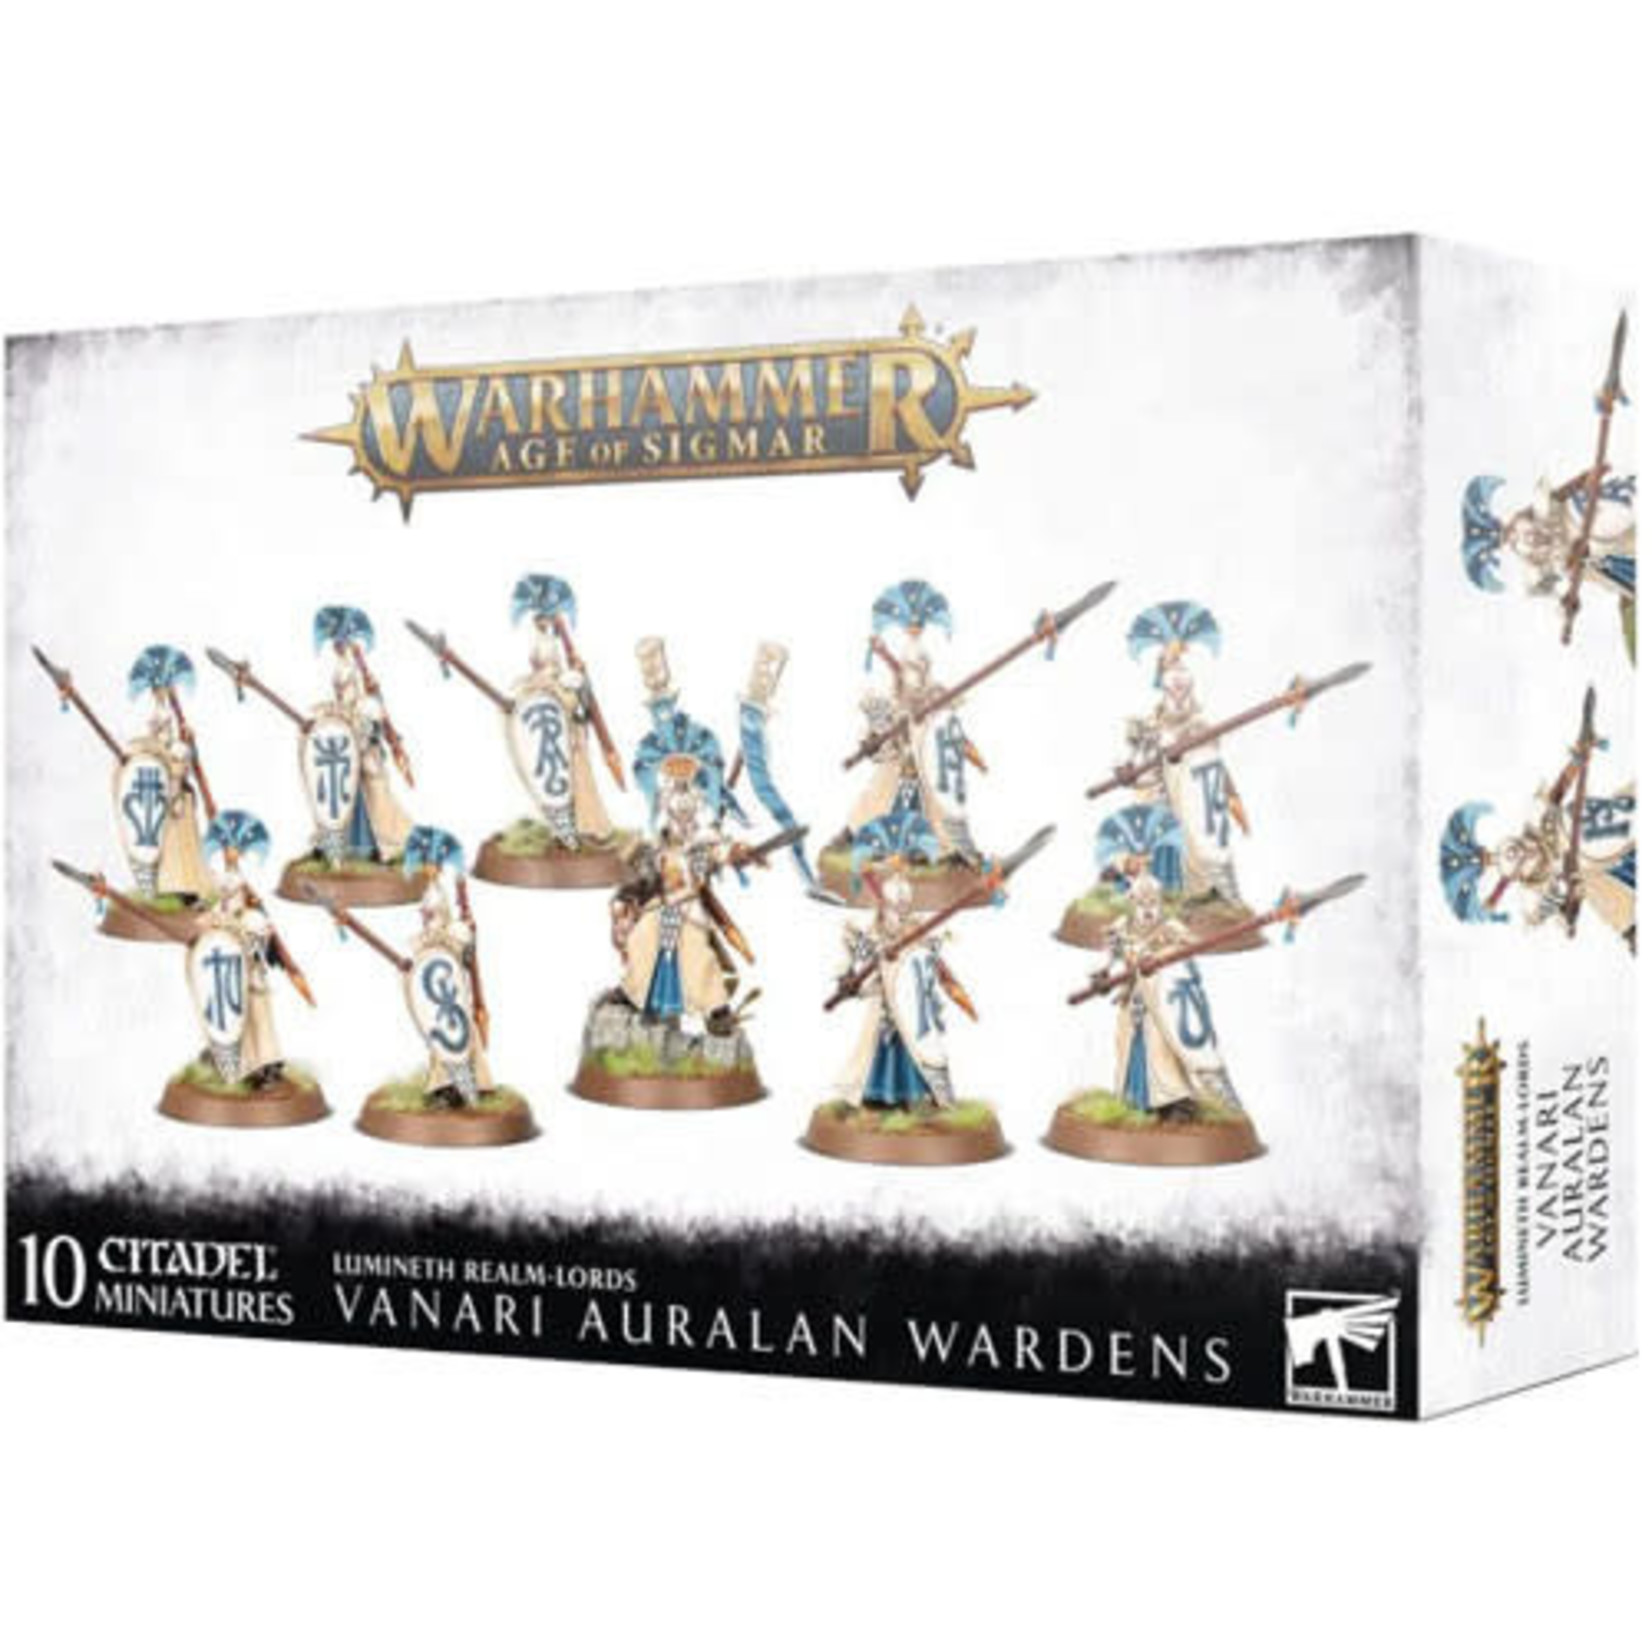 Lumineth Realm Lords Vanari Auralan Wardens (AOS)